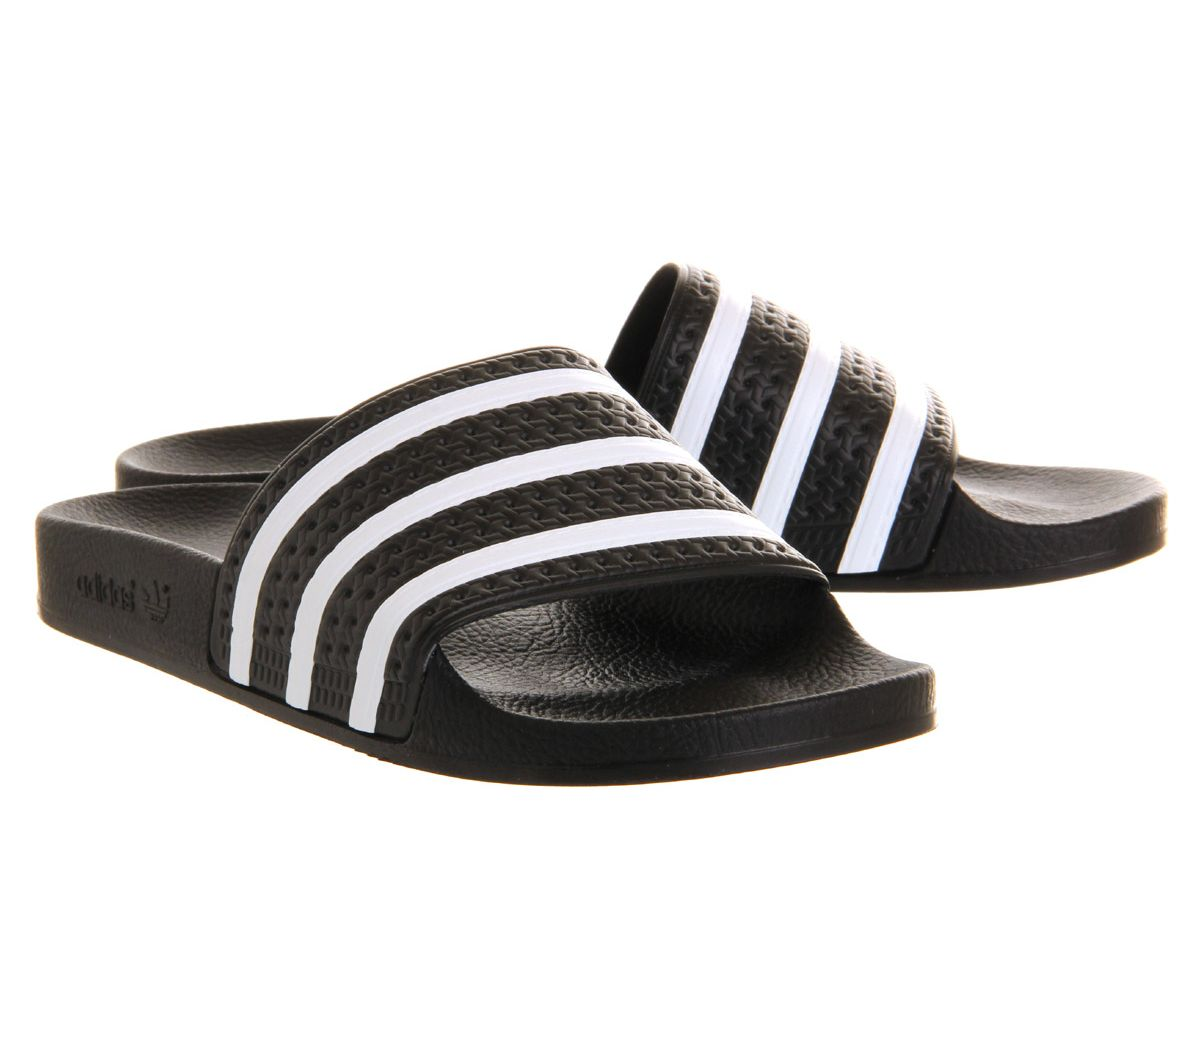 new arrivals 8eac4 6d199 Short-Femme-Adidas-Sandals-Sliders-Noir-Blanc miniature 19